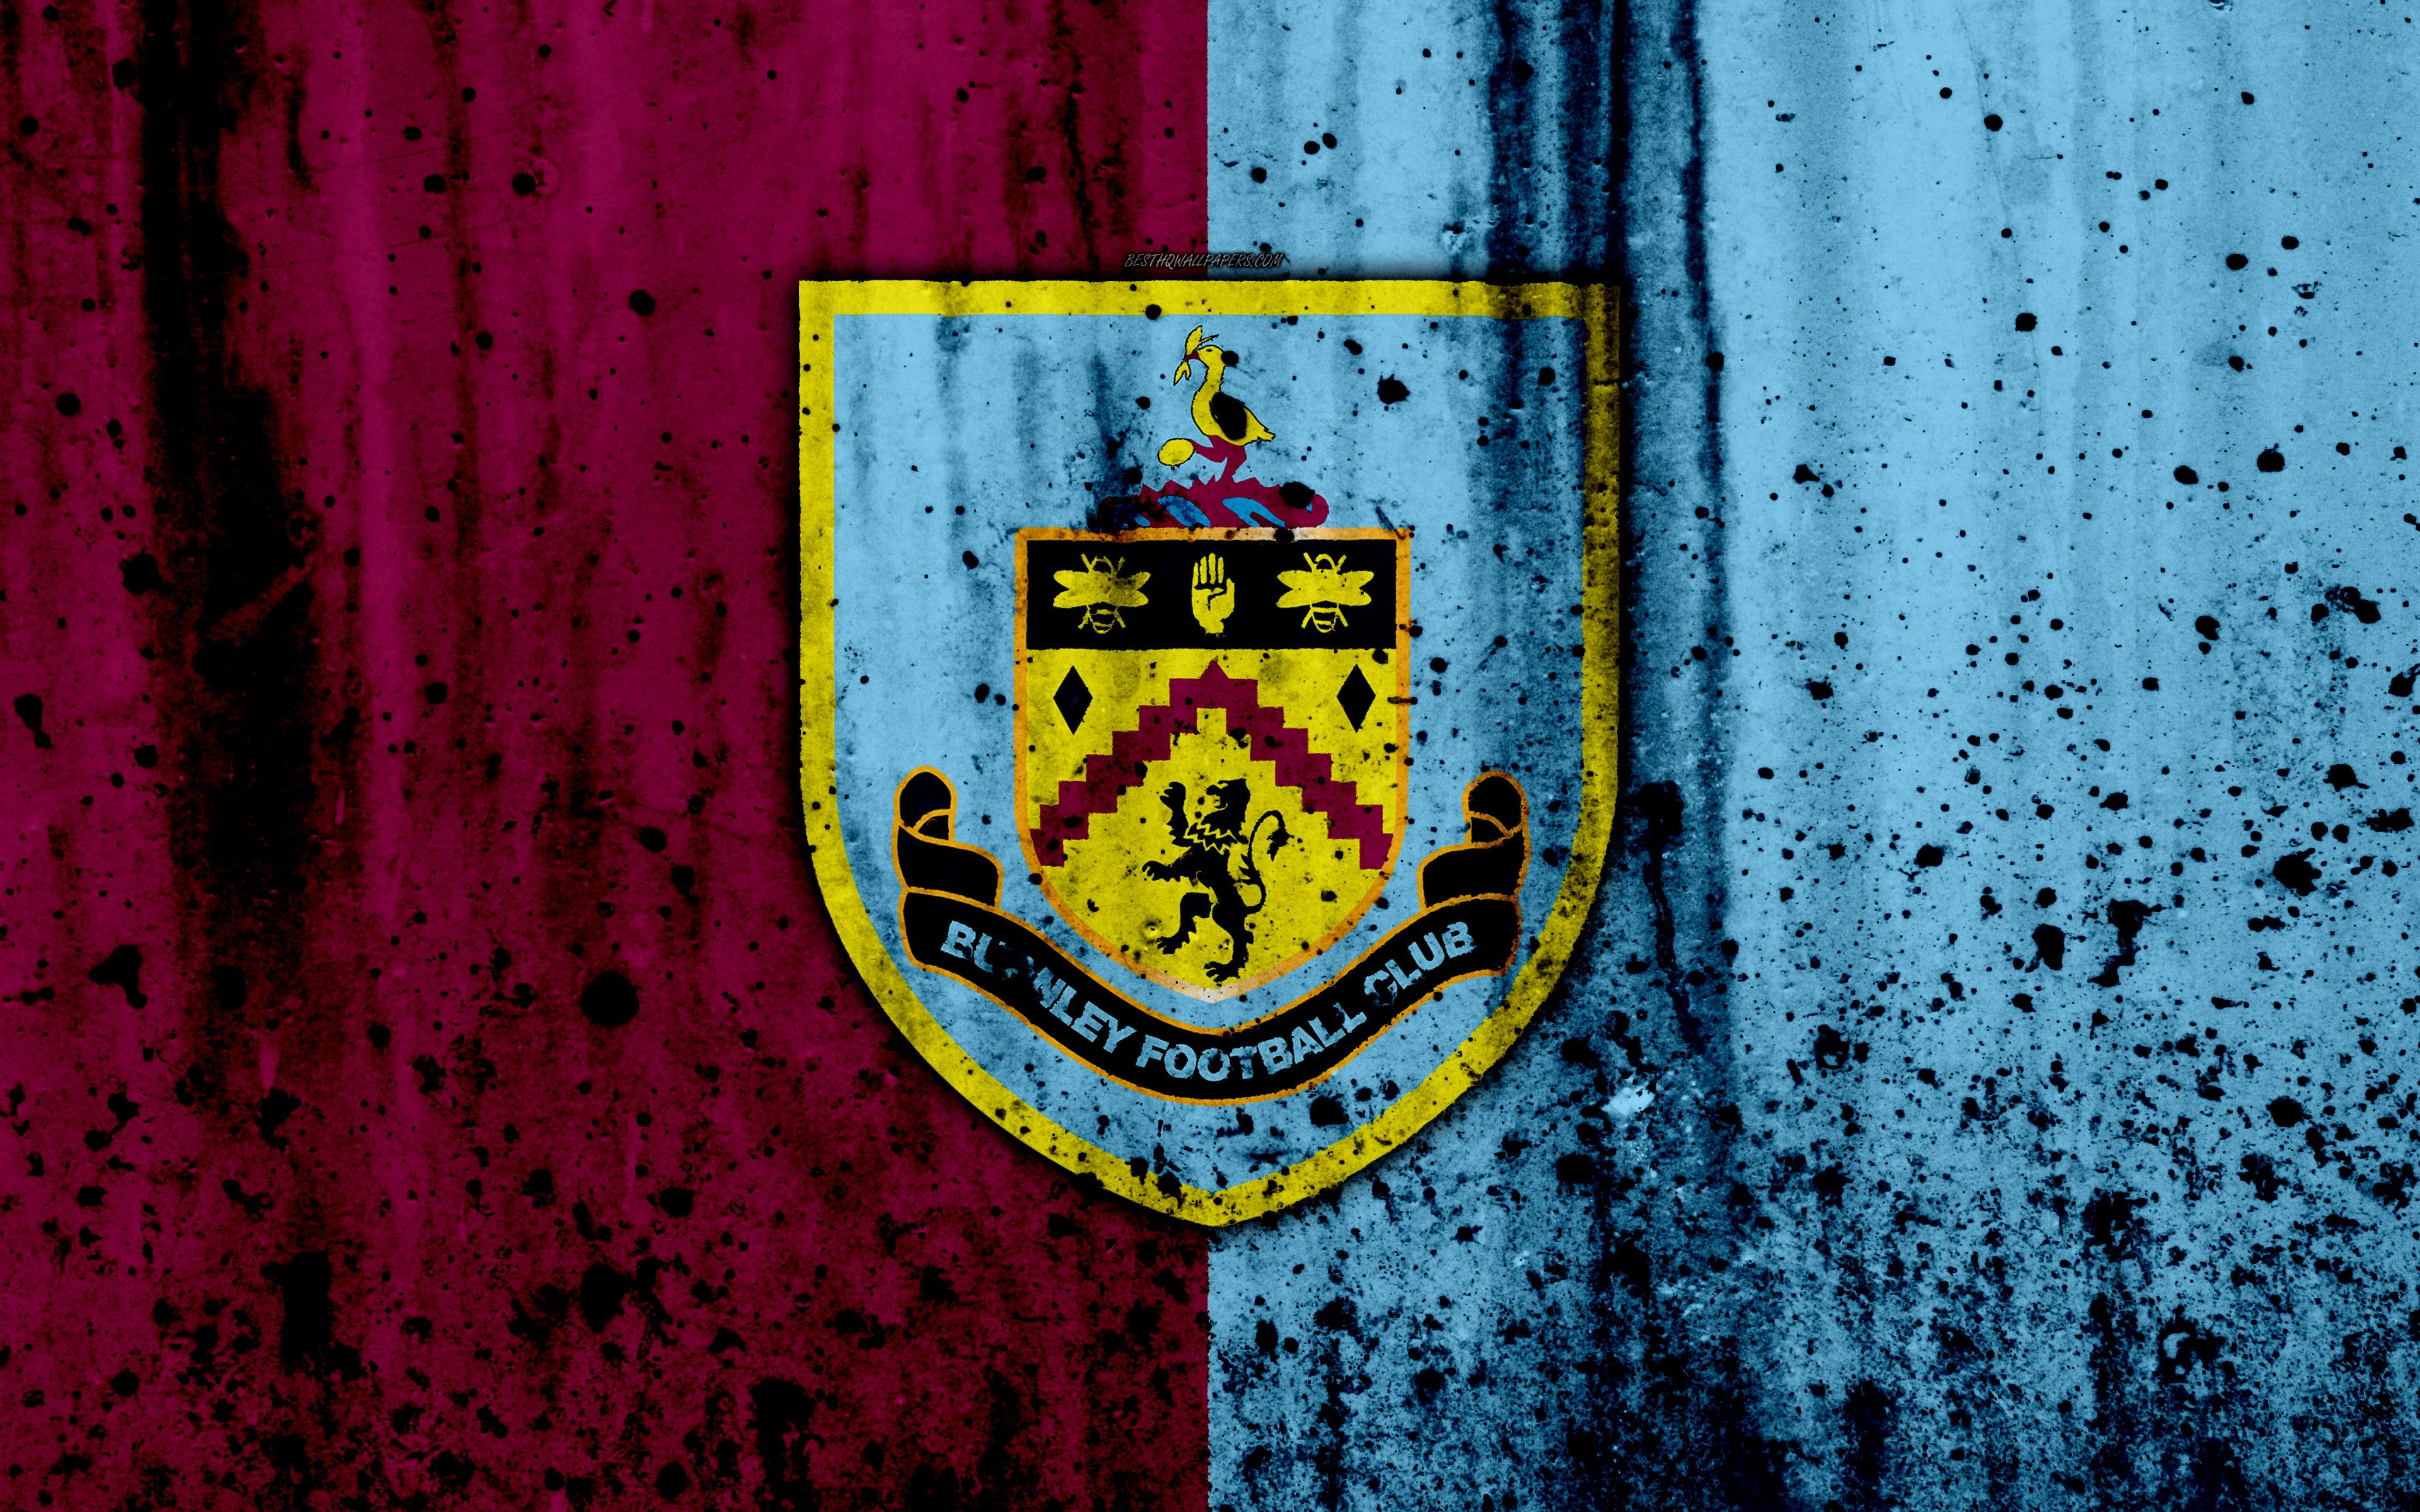 Download wallpapers FC Burnley 4k Premier League logo England 3840x2400